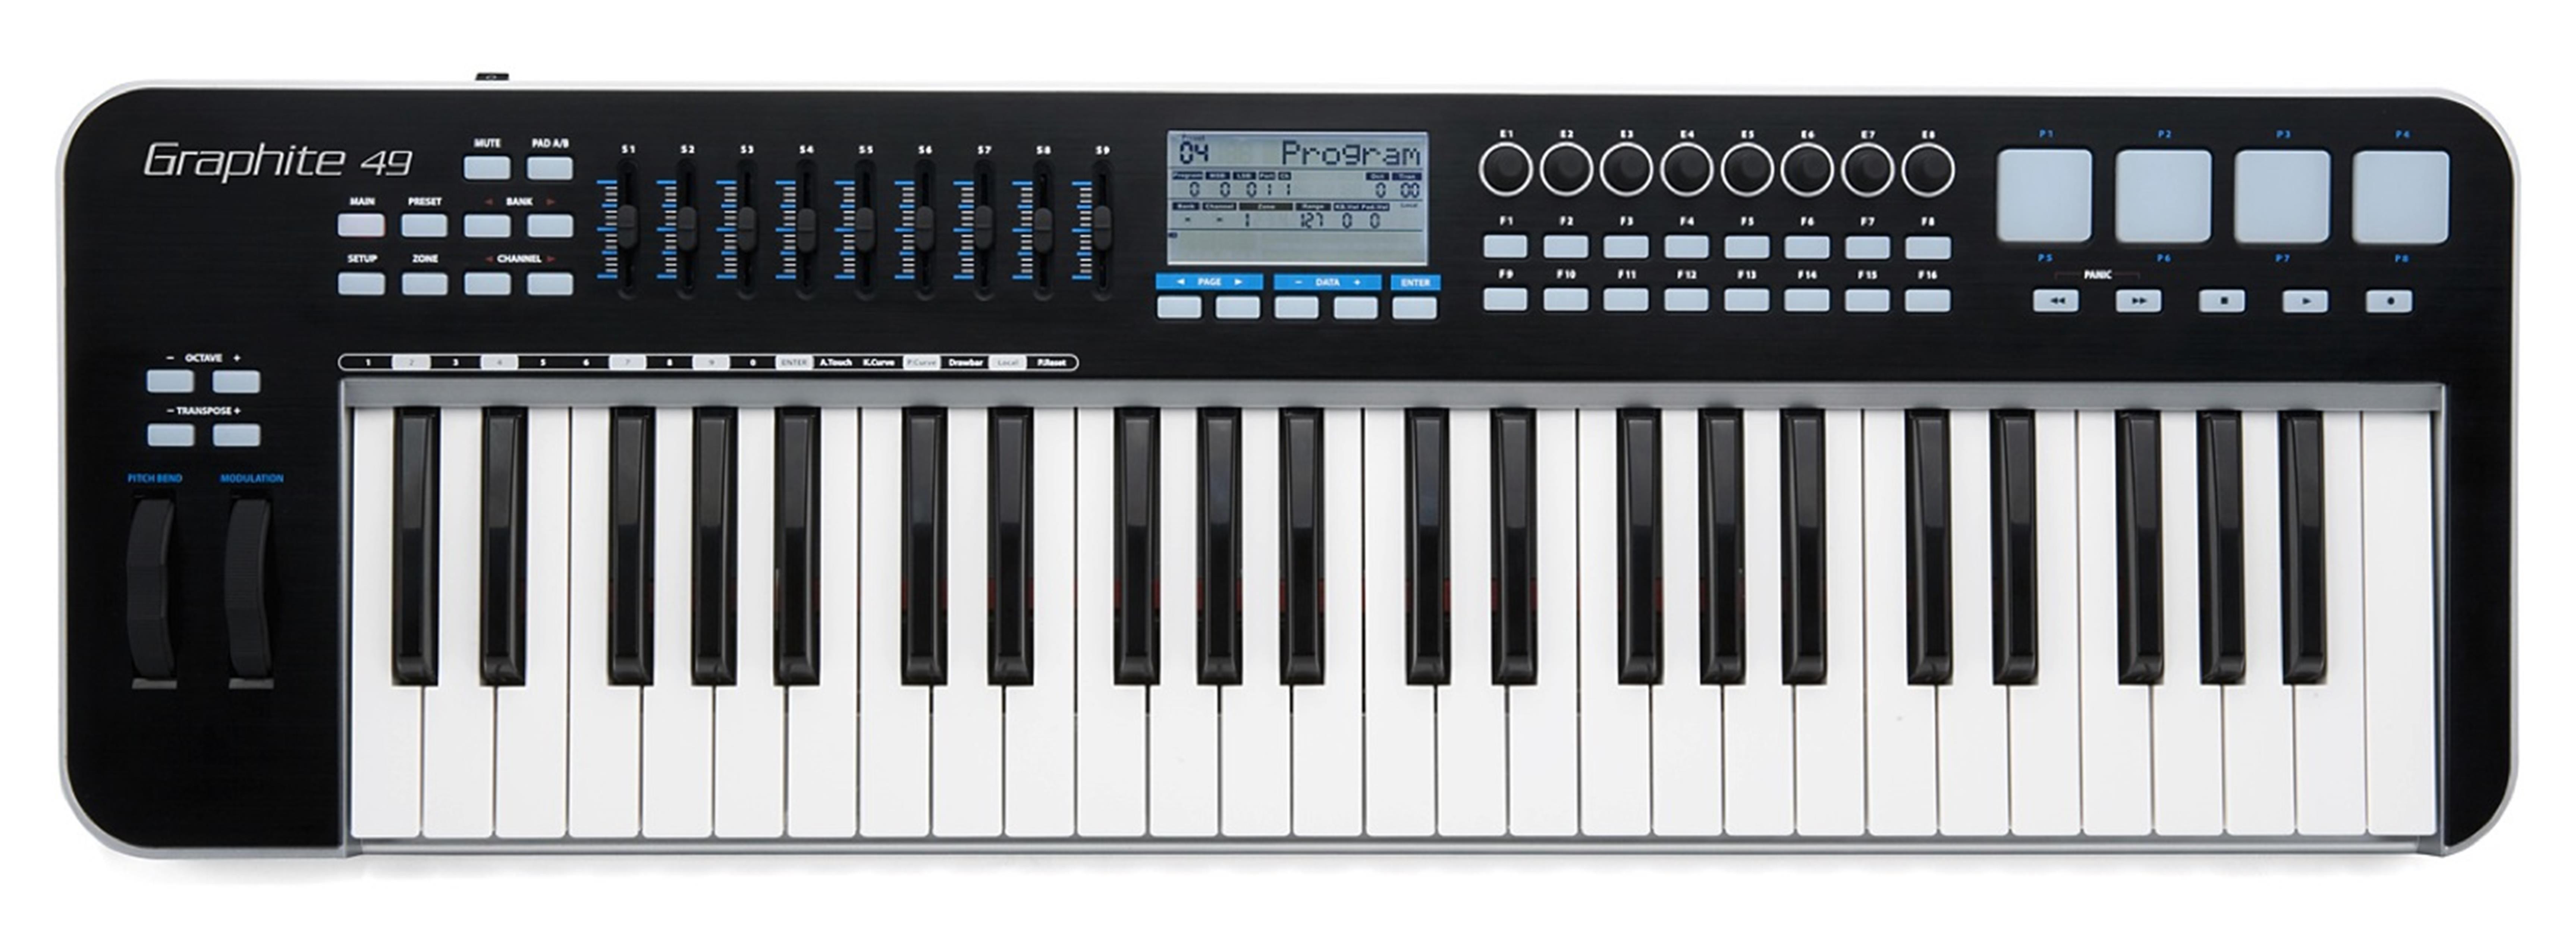 SAMSON GRAPHITE 49 - MIDI Controller USB